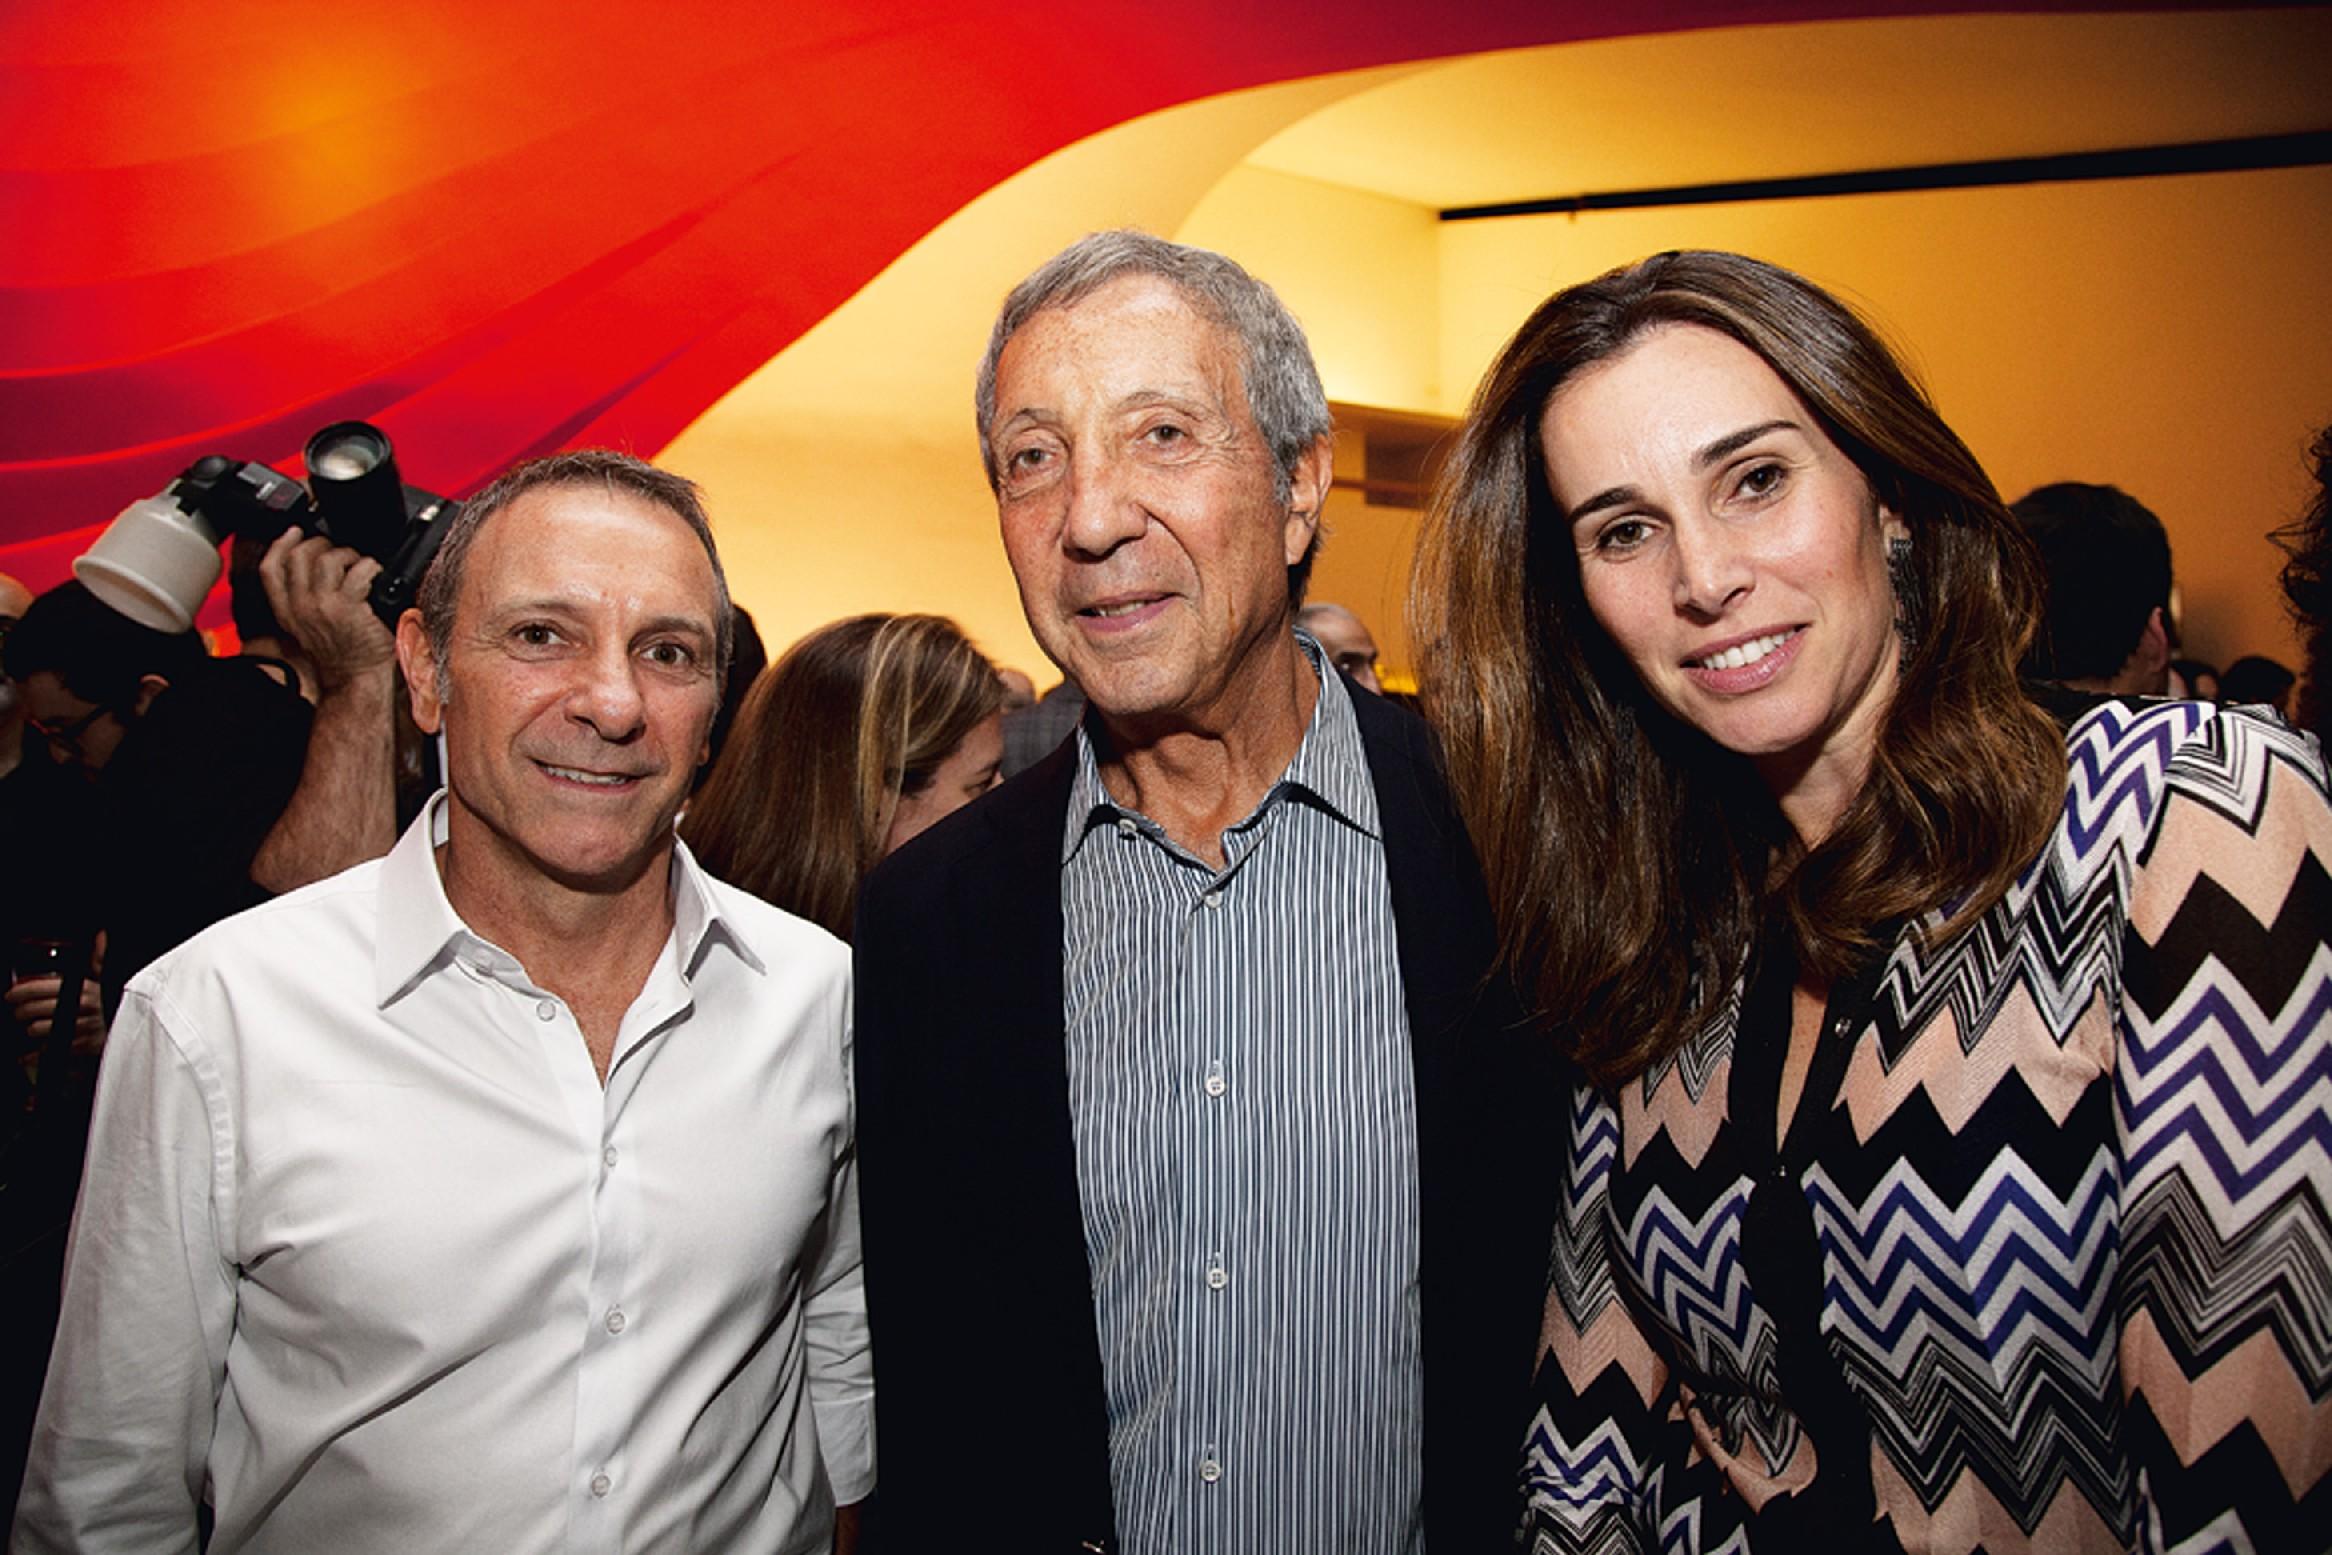 Carlos Sarli, Abílio e Geyze Diniz